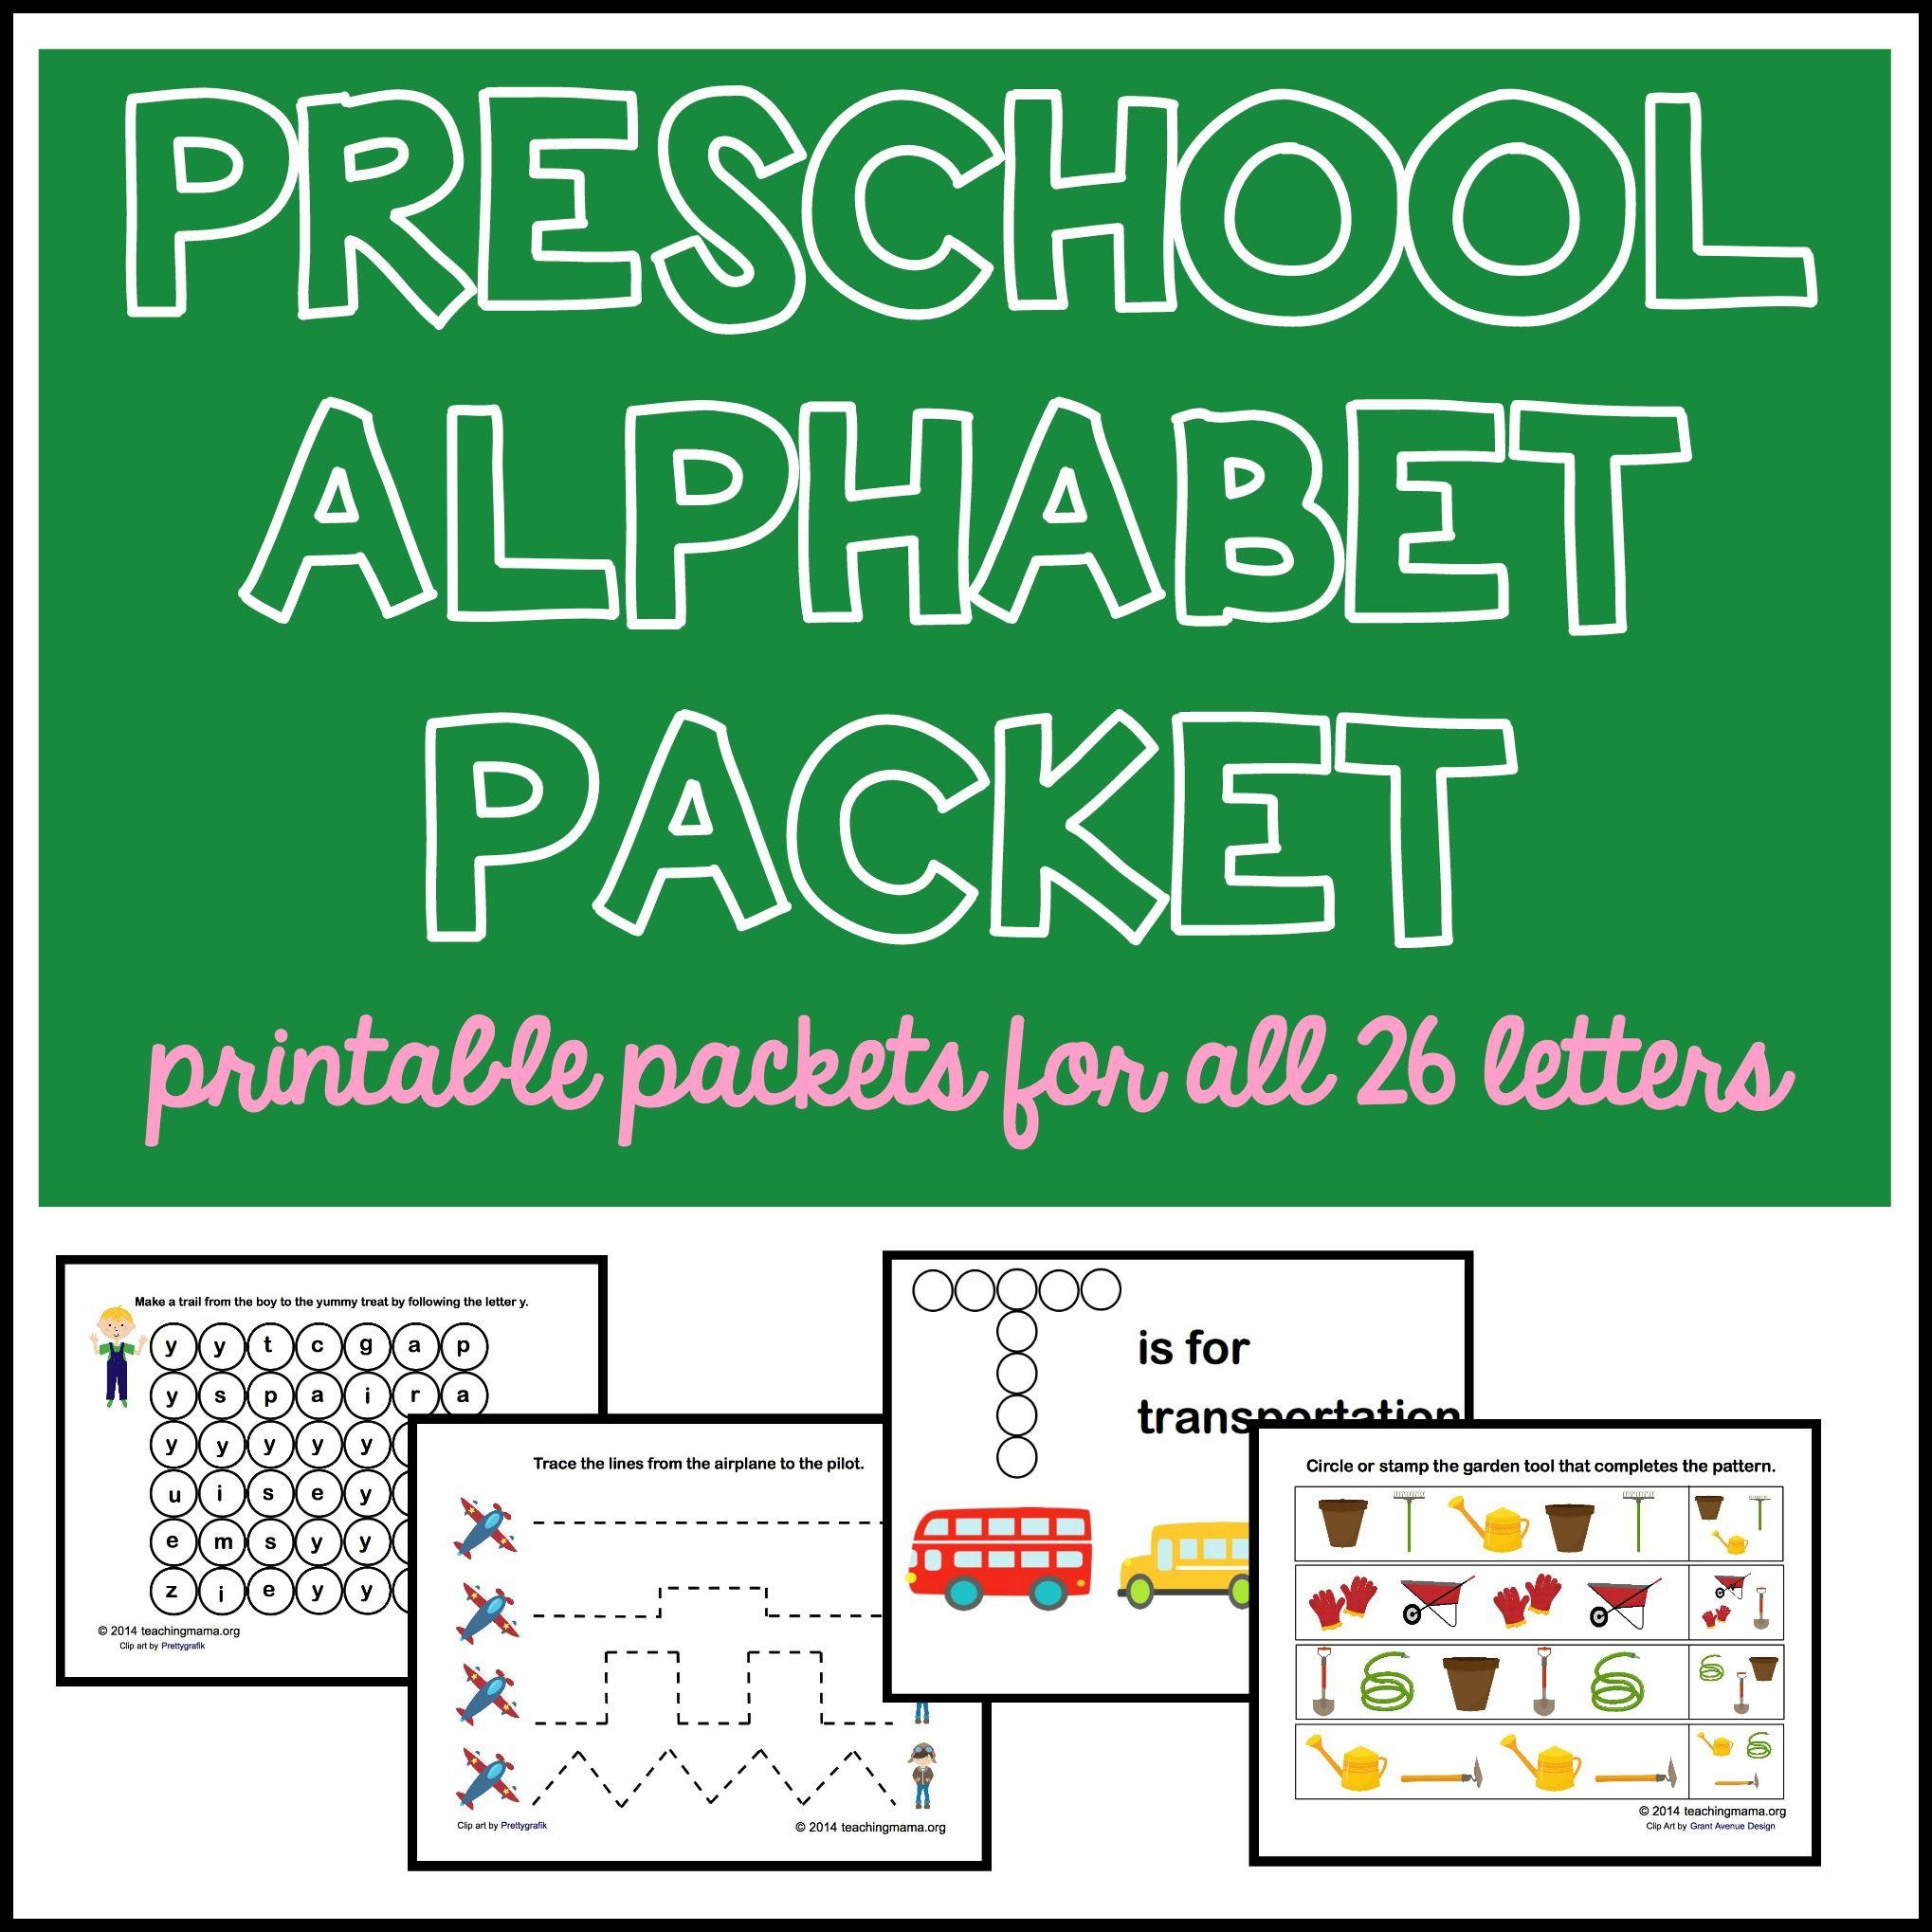 Preschool Alphabet Packet